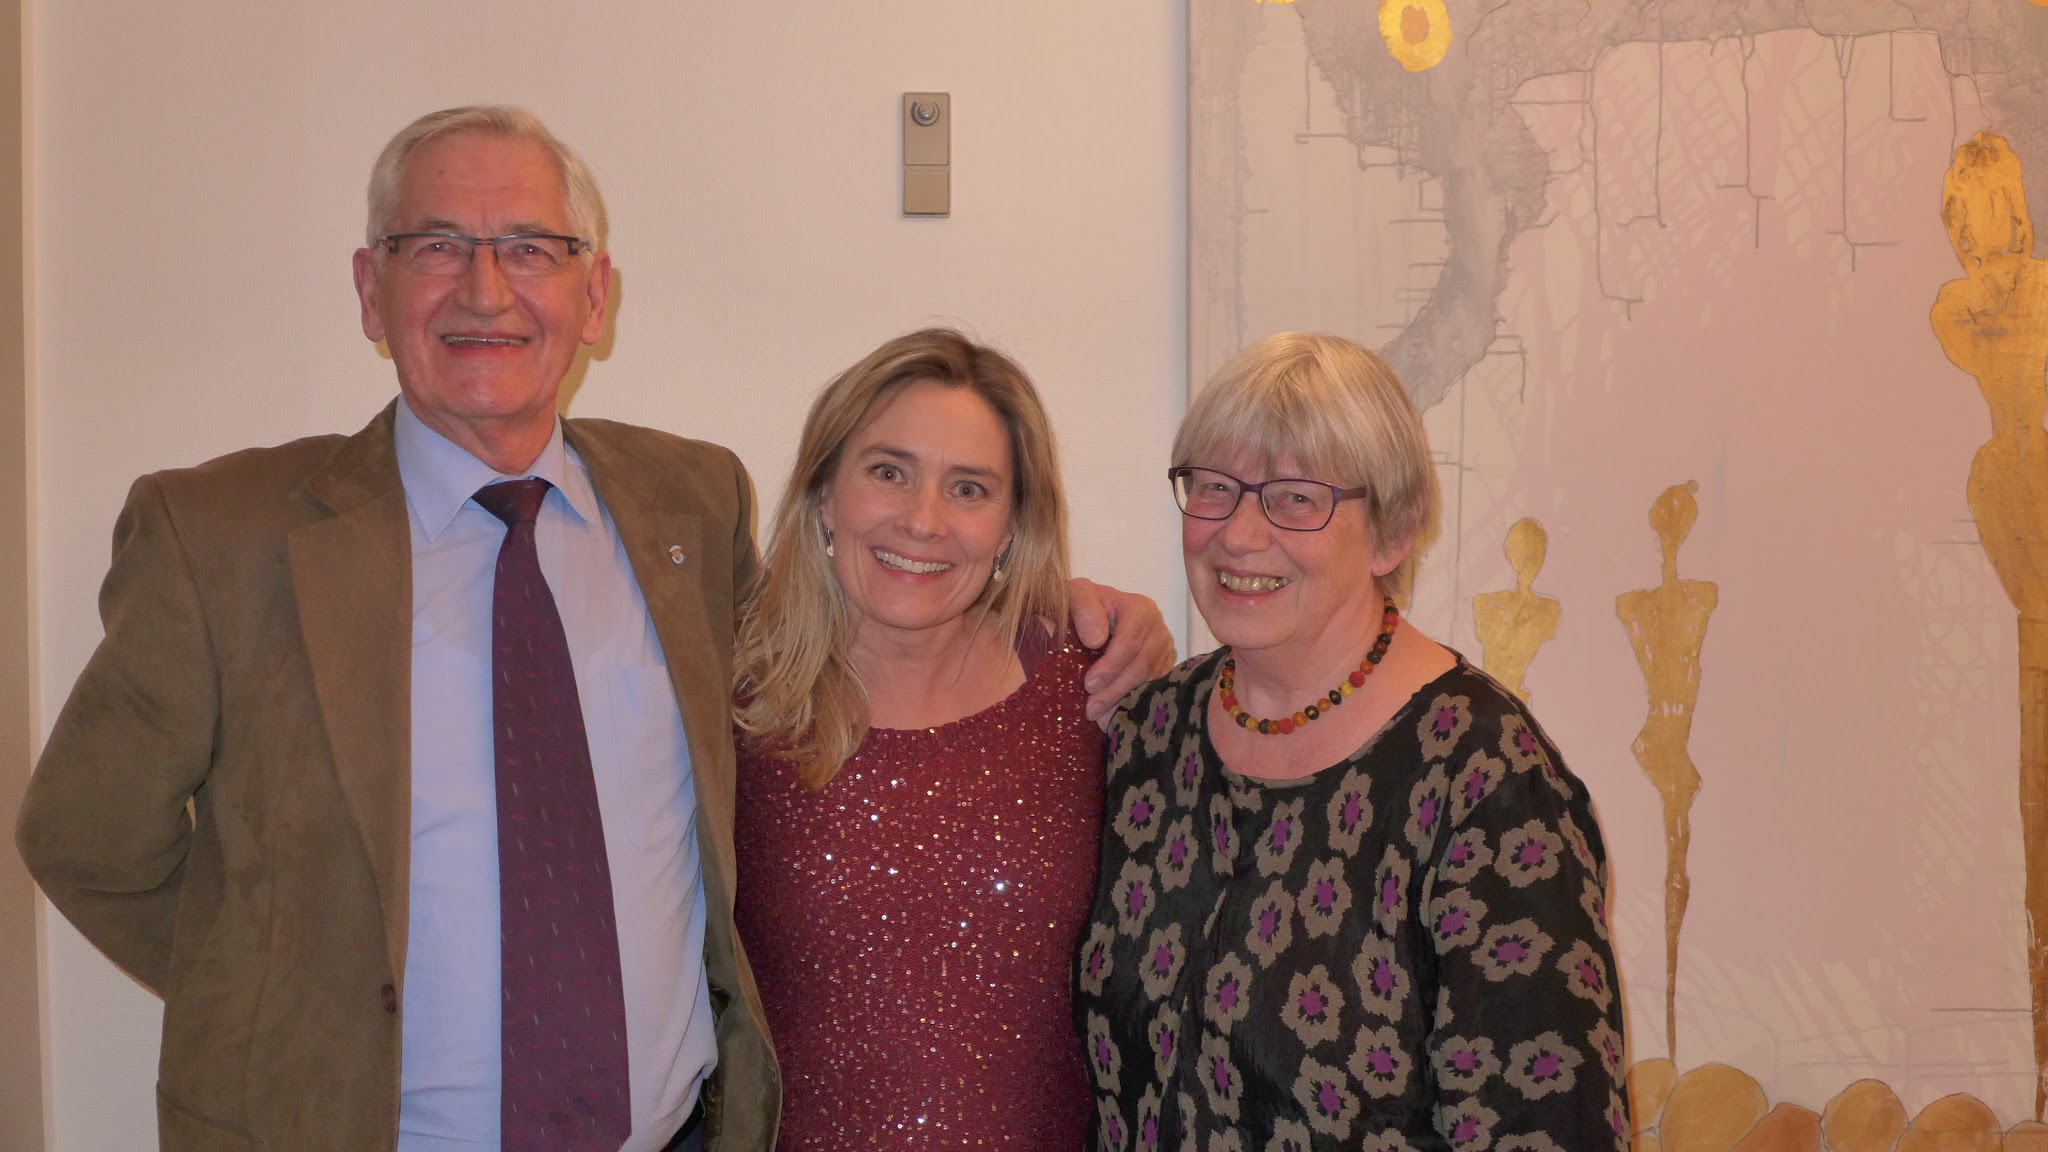 Photo: Arne Pedersen, Anna Louise Tranæs og Kirsten Johanne Vase